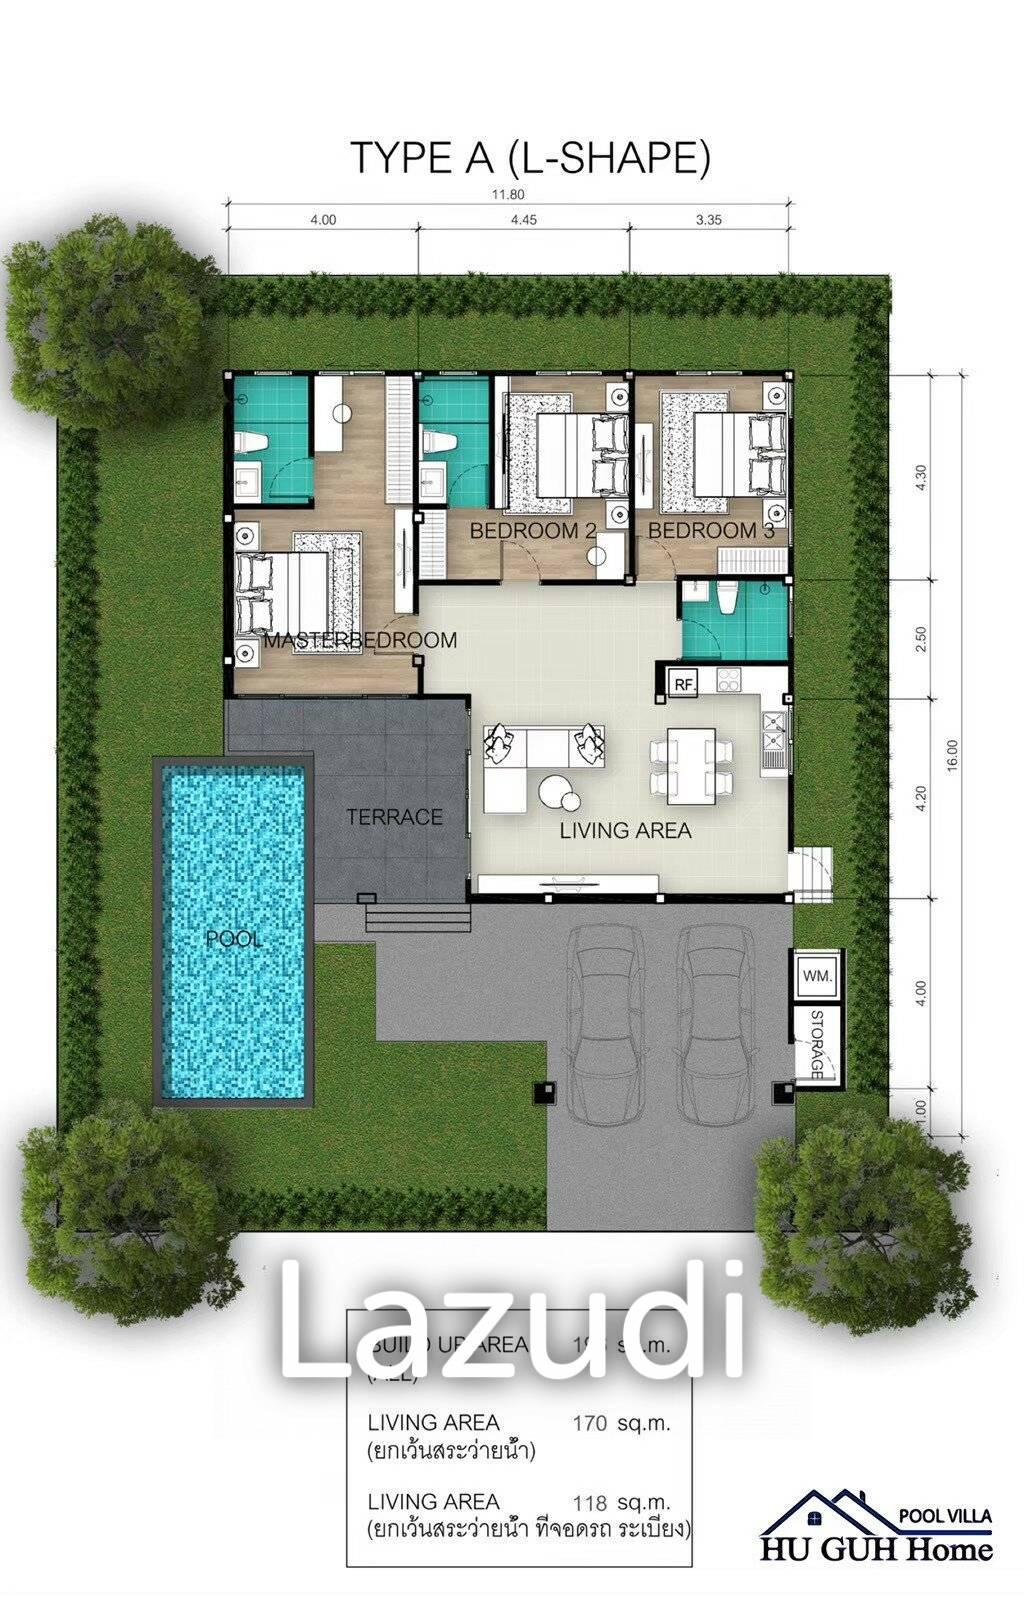 3 bed 80SQM Huguh Home Pool Villa Cha-Am